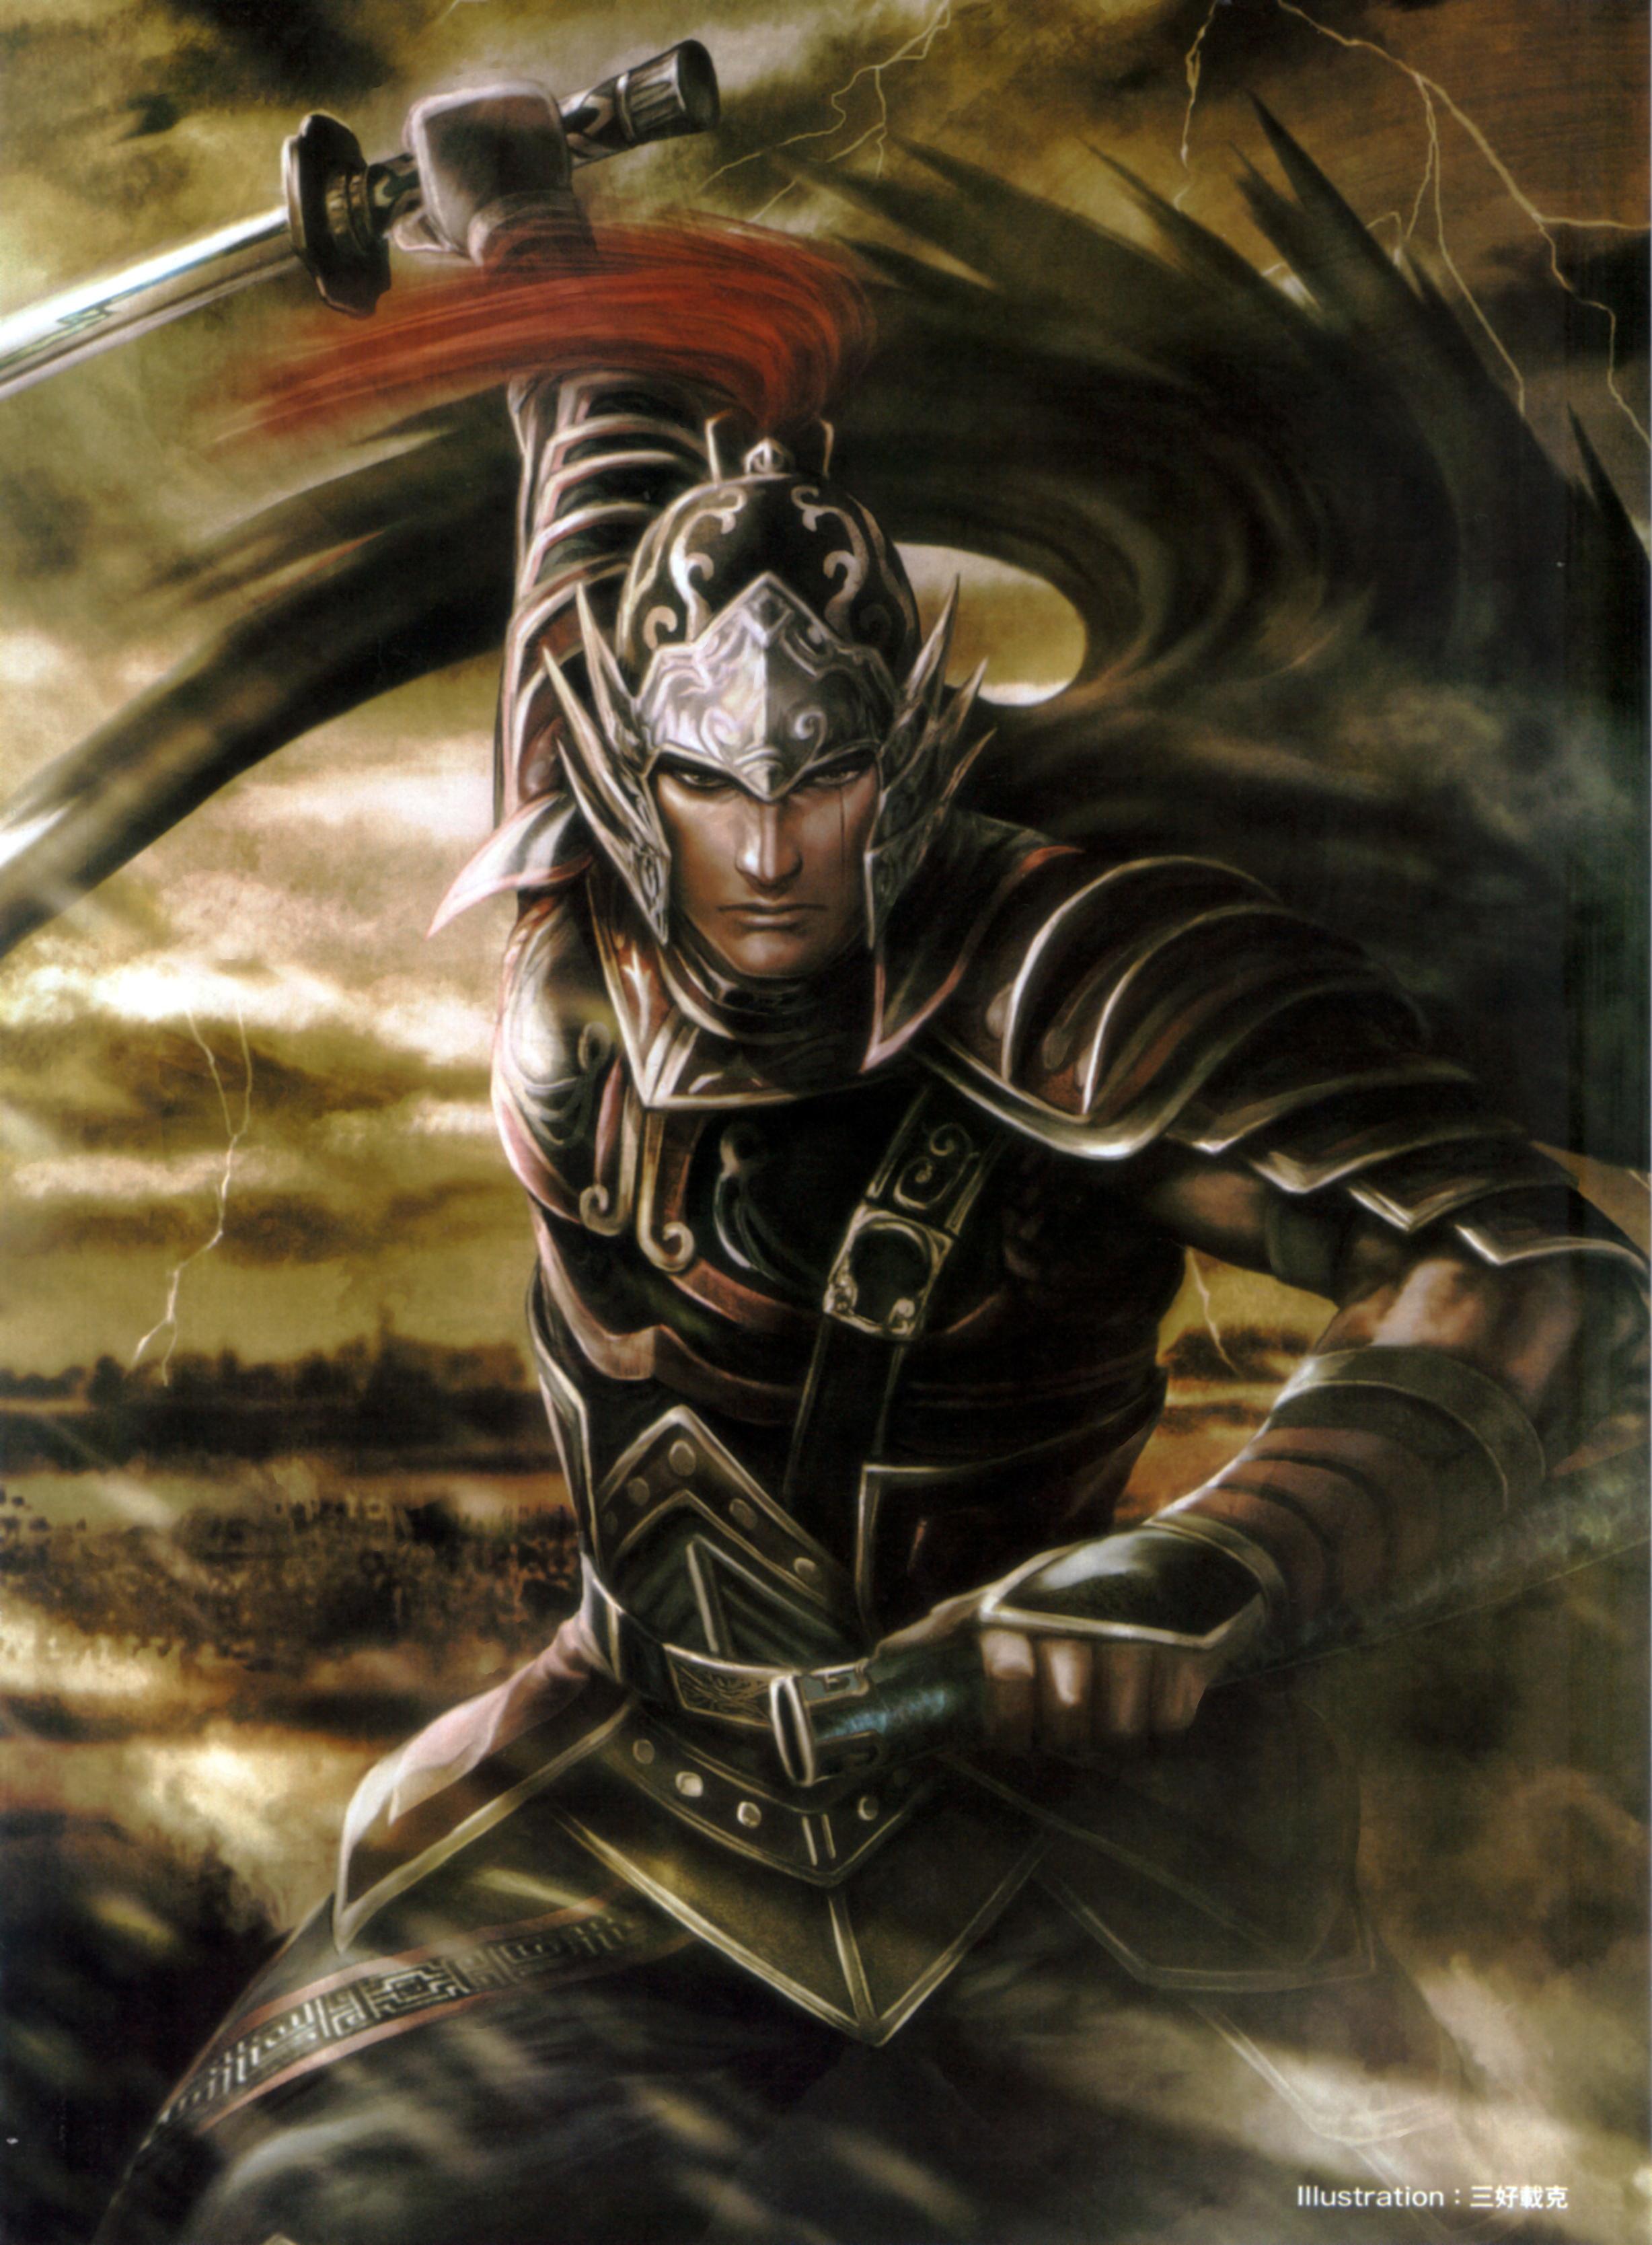 Drawn warrior zhou dynasty Avenger Idea] Skin Kingdom Dark